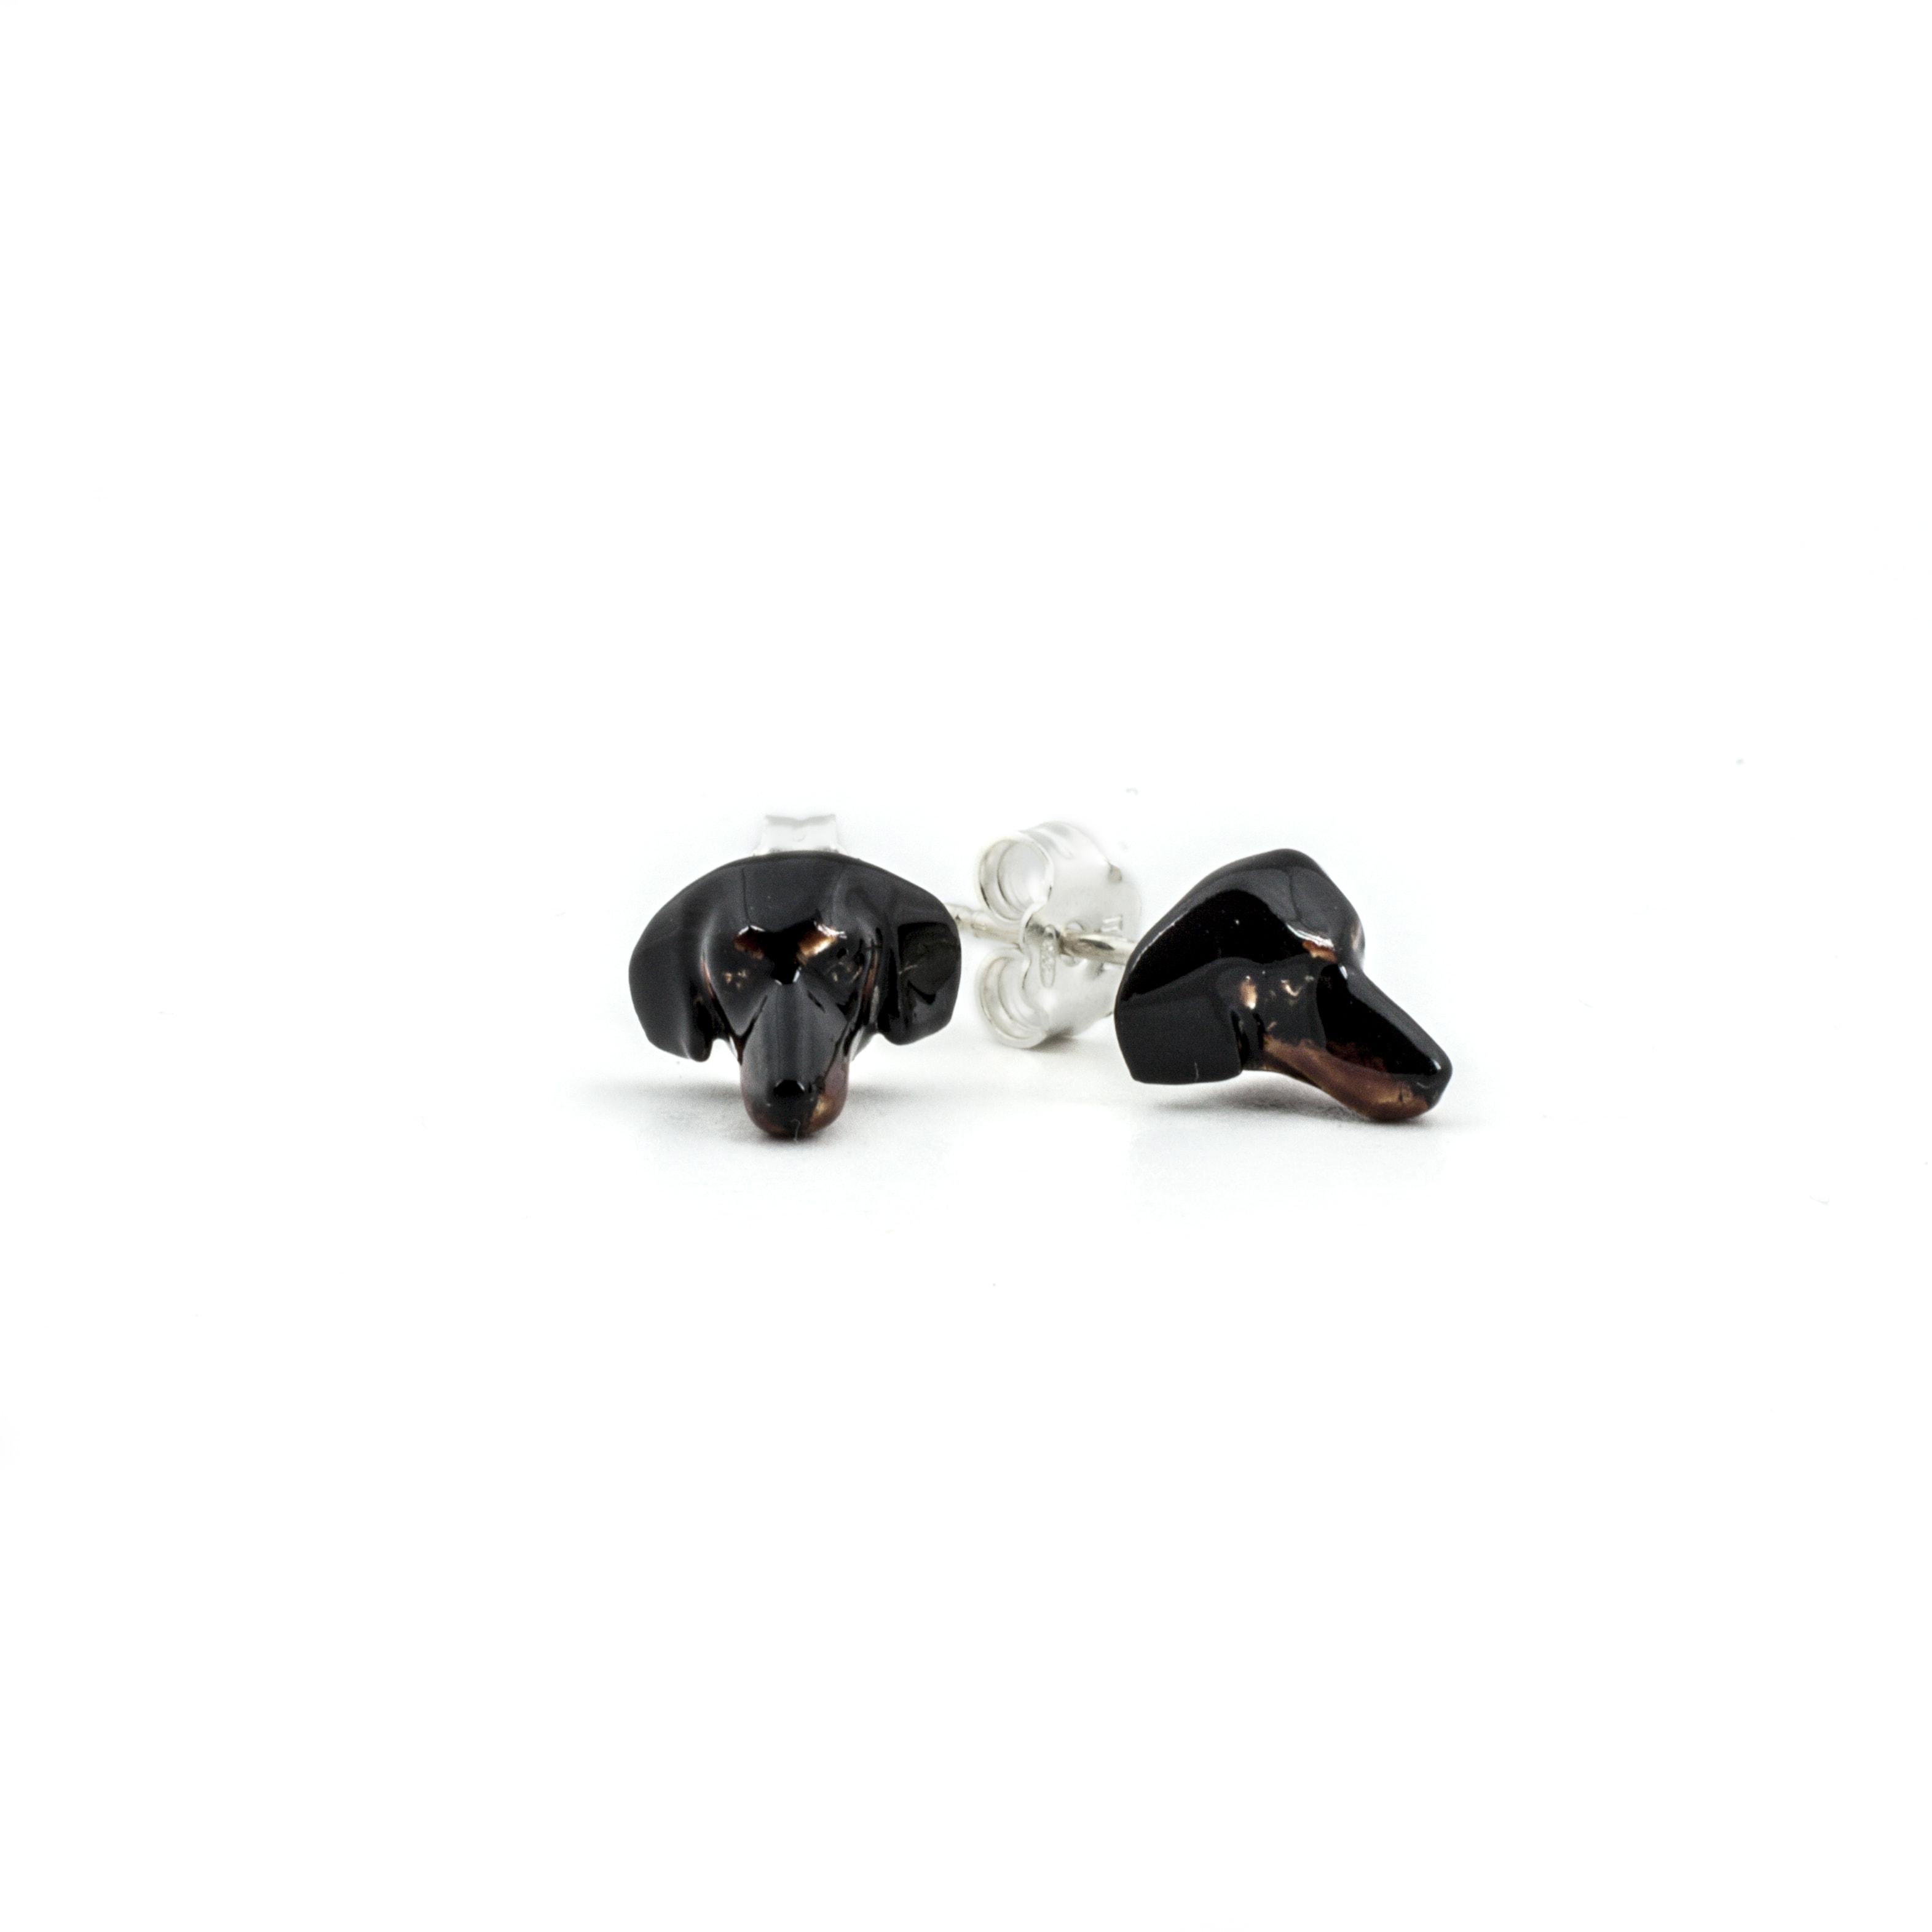 Dachshund_earrings_enameled_HIGH